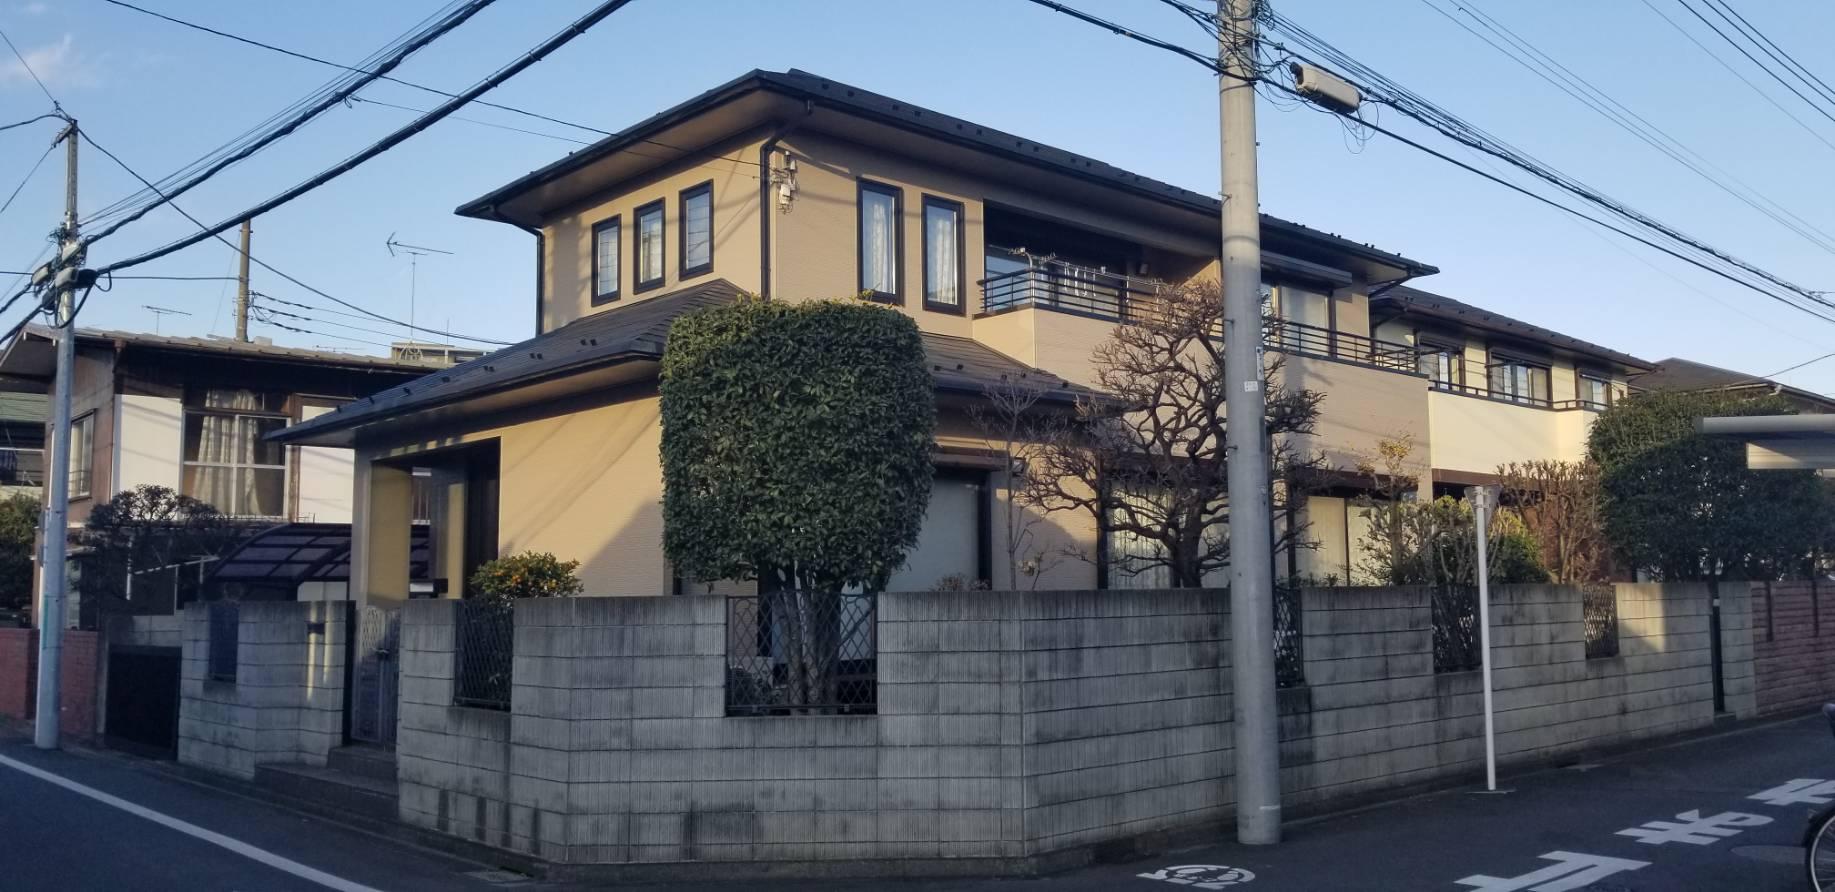 A image of 東京都多摩市 解体工事 【東京・埼玉・神奈川の解体工事なら東央建設へ】